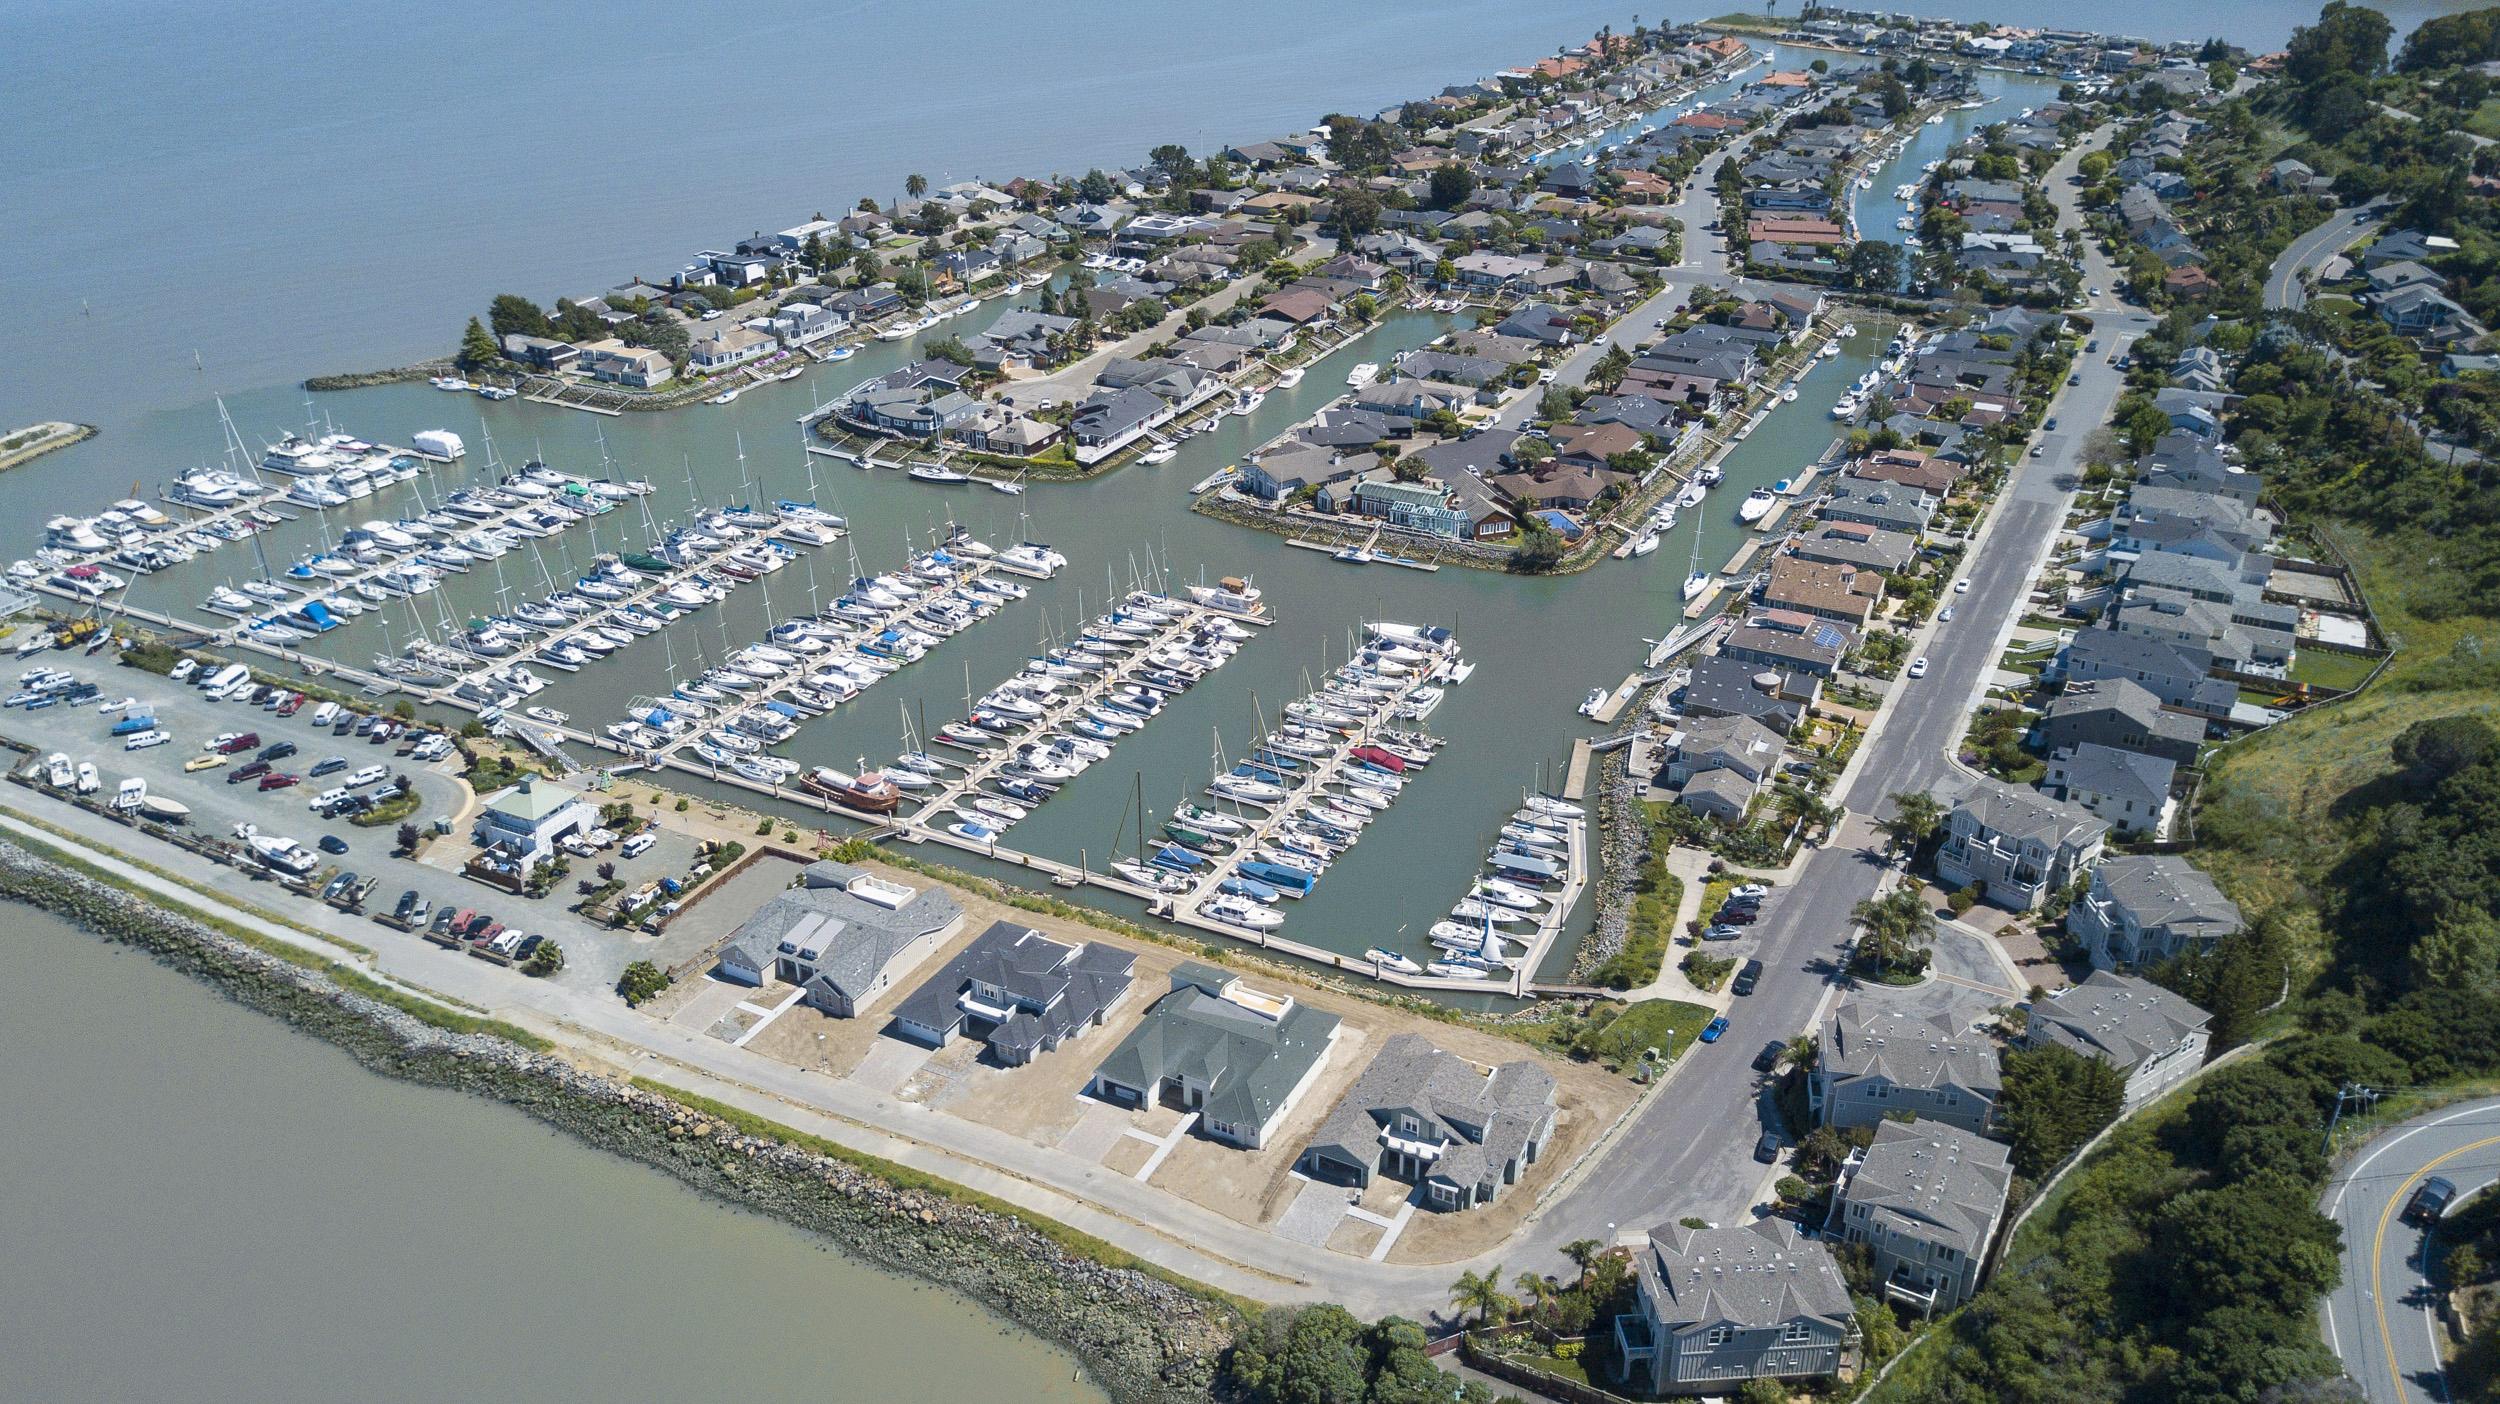 Paradise-Cay-Yacht-Harbor-Aerial (16 of 25) EDITED.jpg